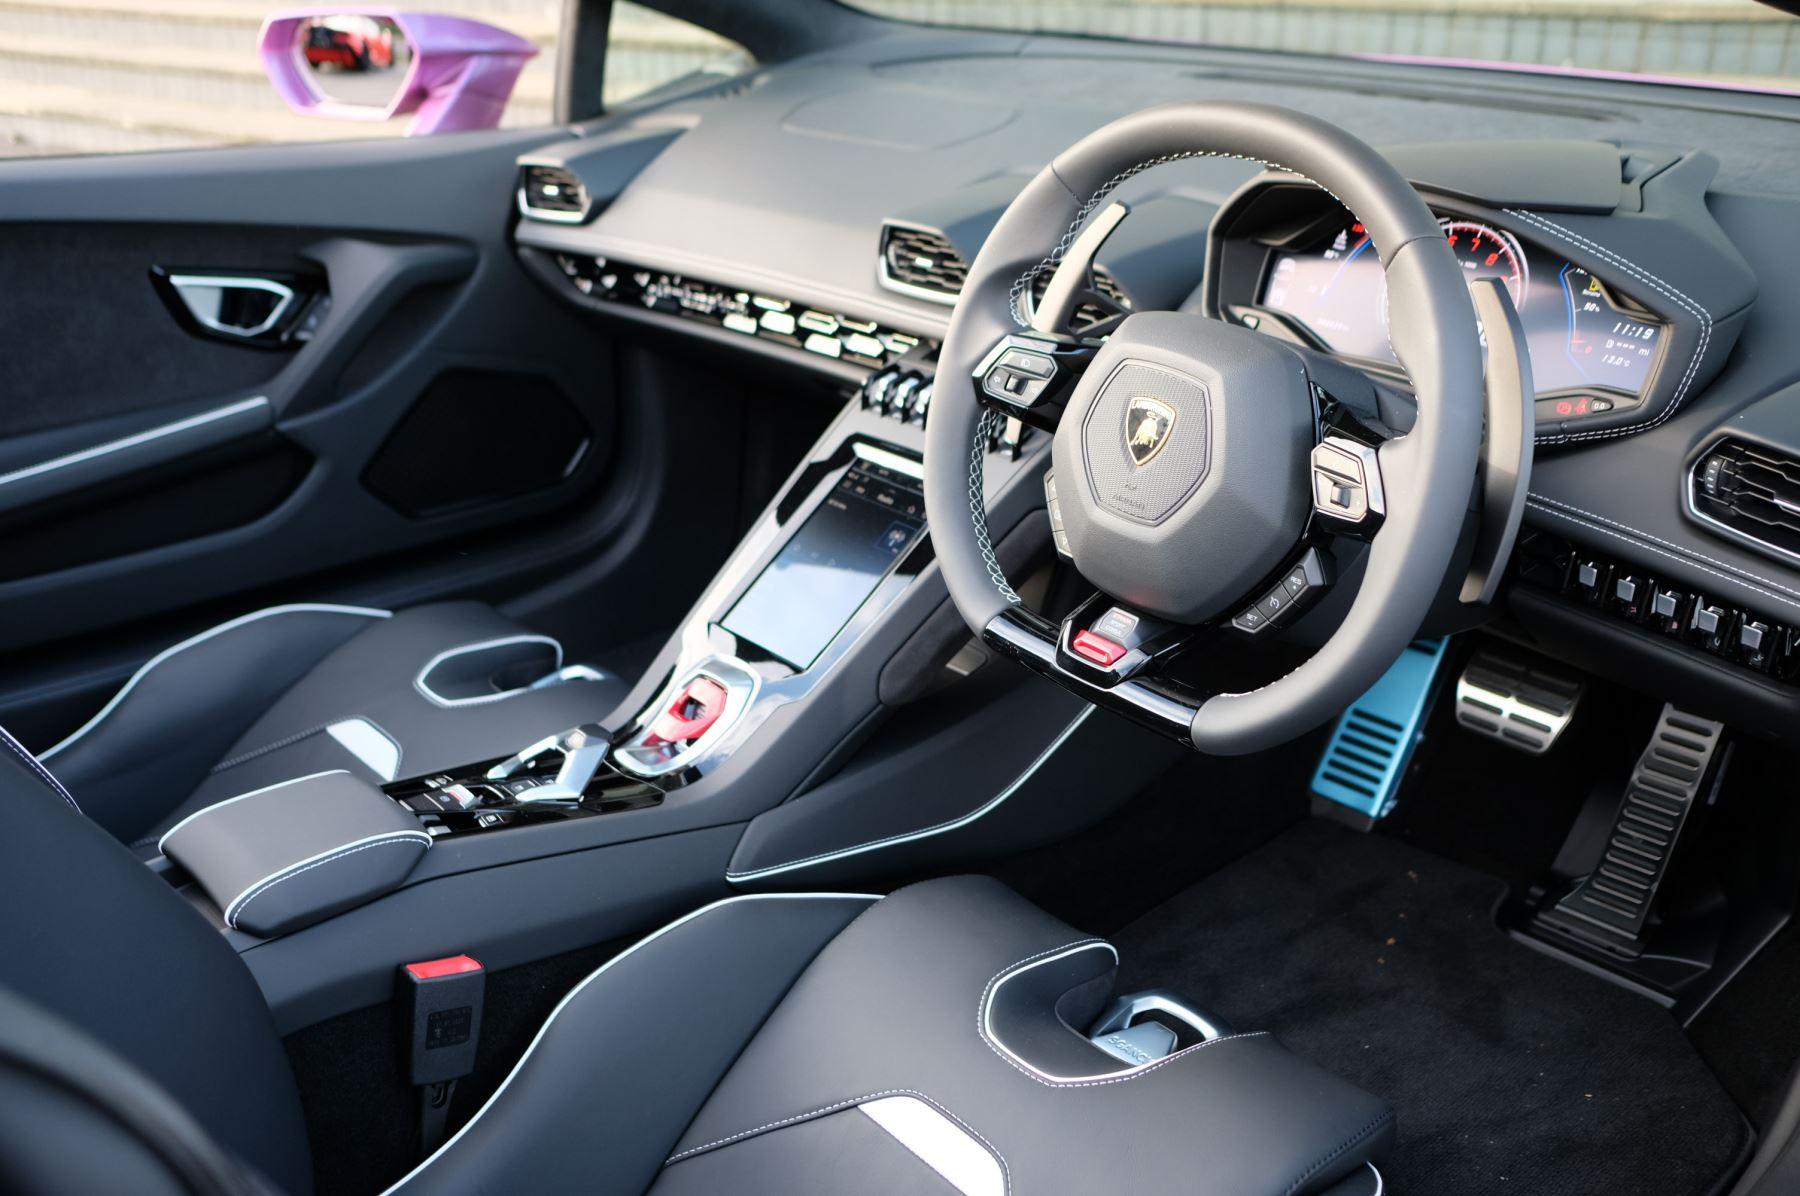 Lamborghini Huracan EVO Spyder 5.2 V10 640 2dr Auto AWD image 14